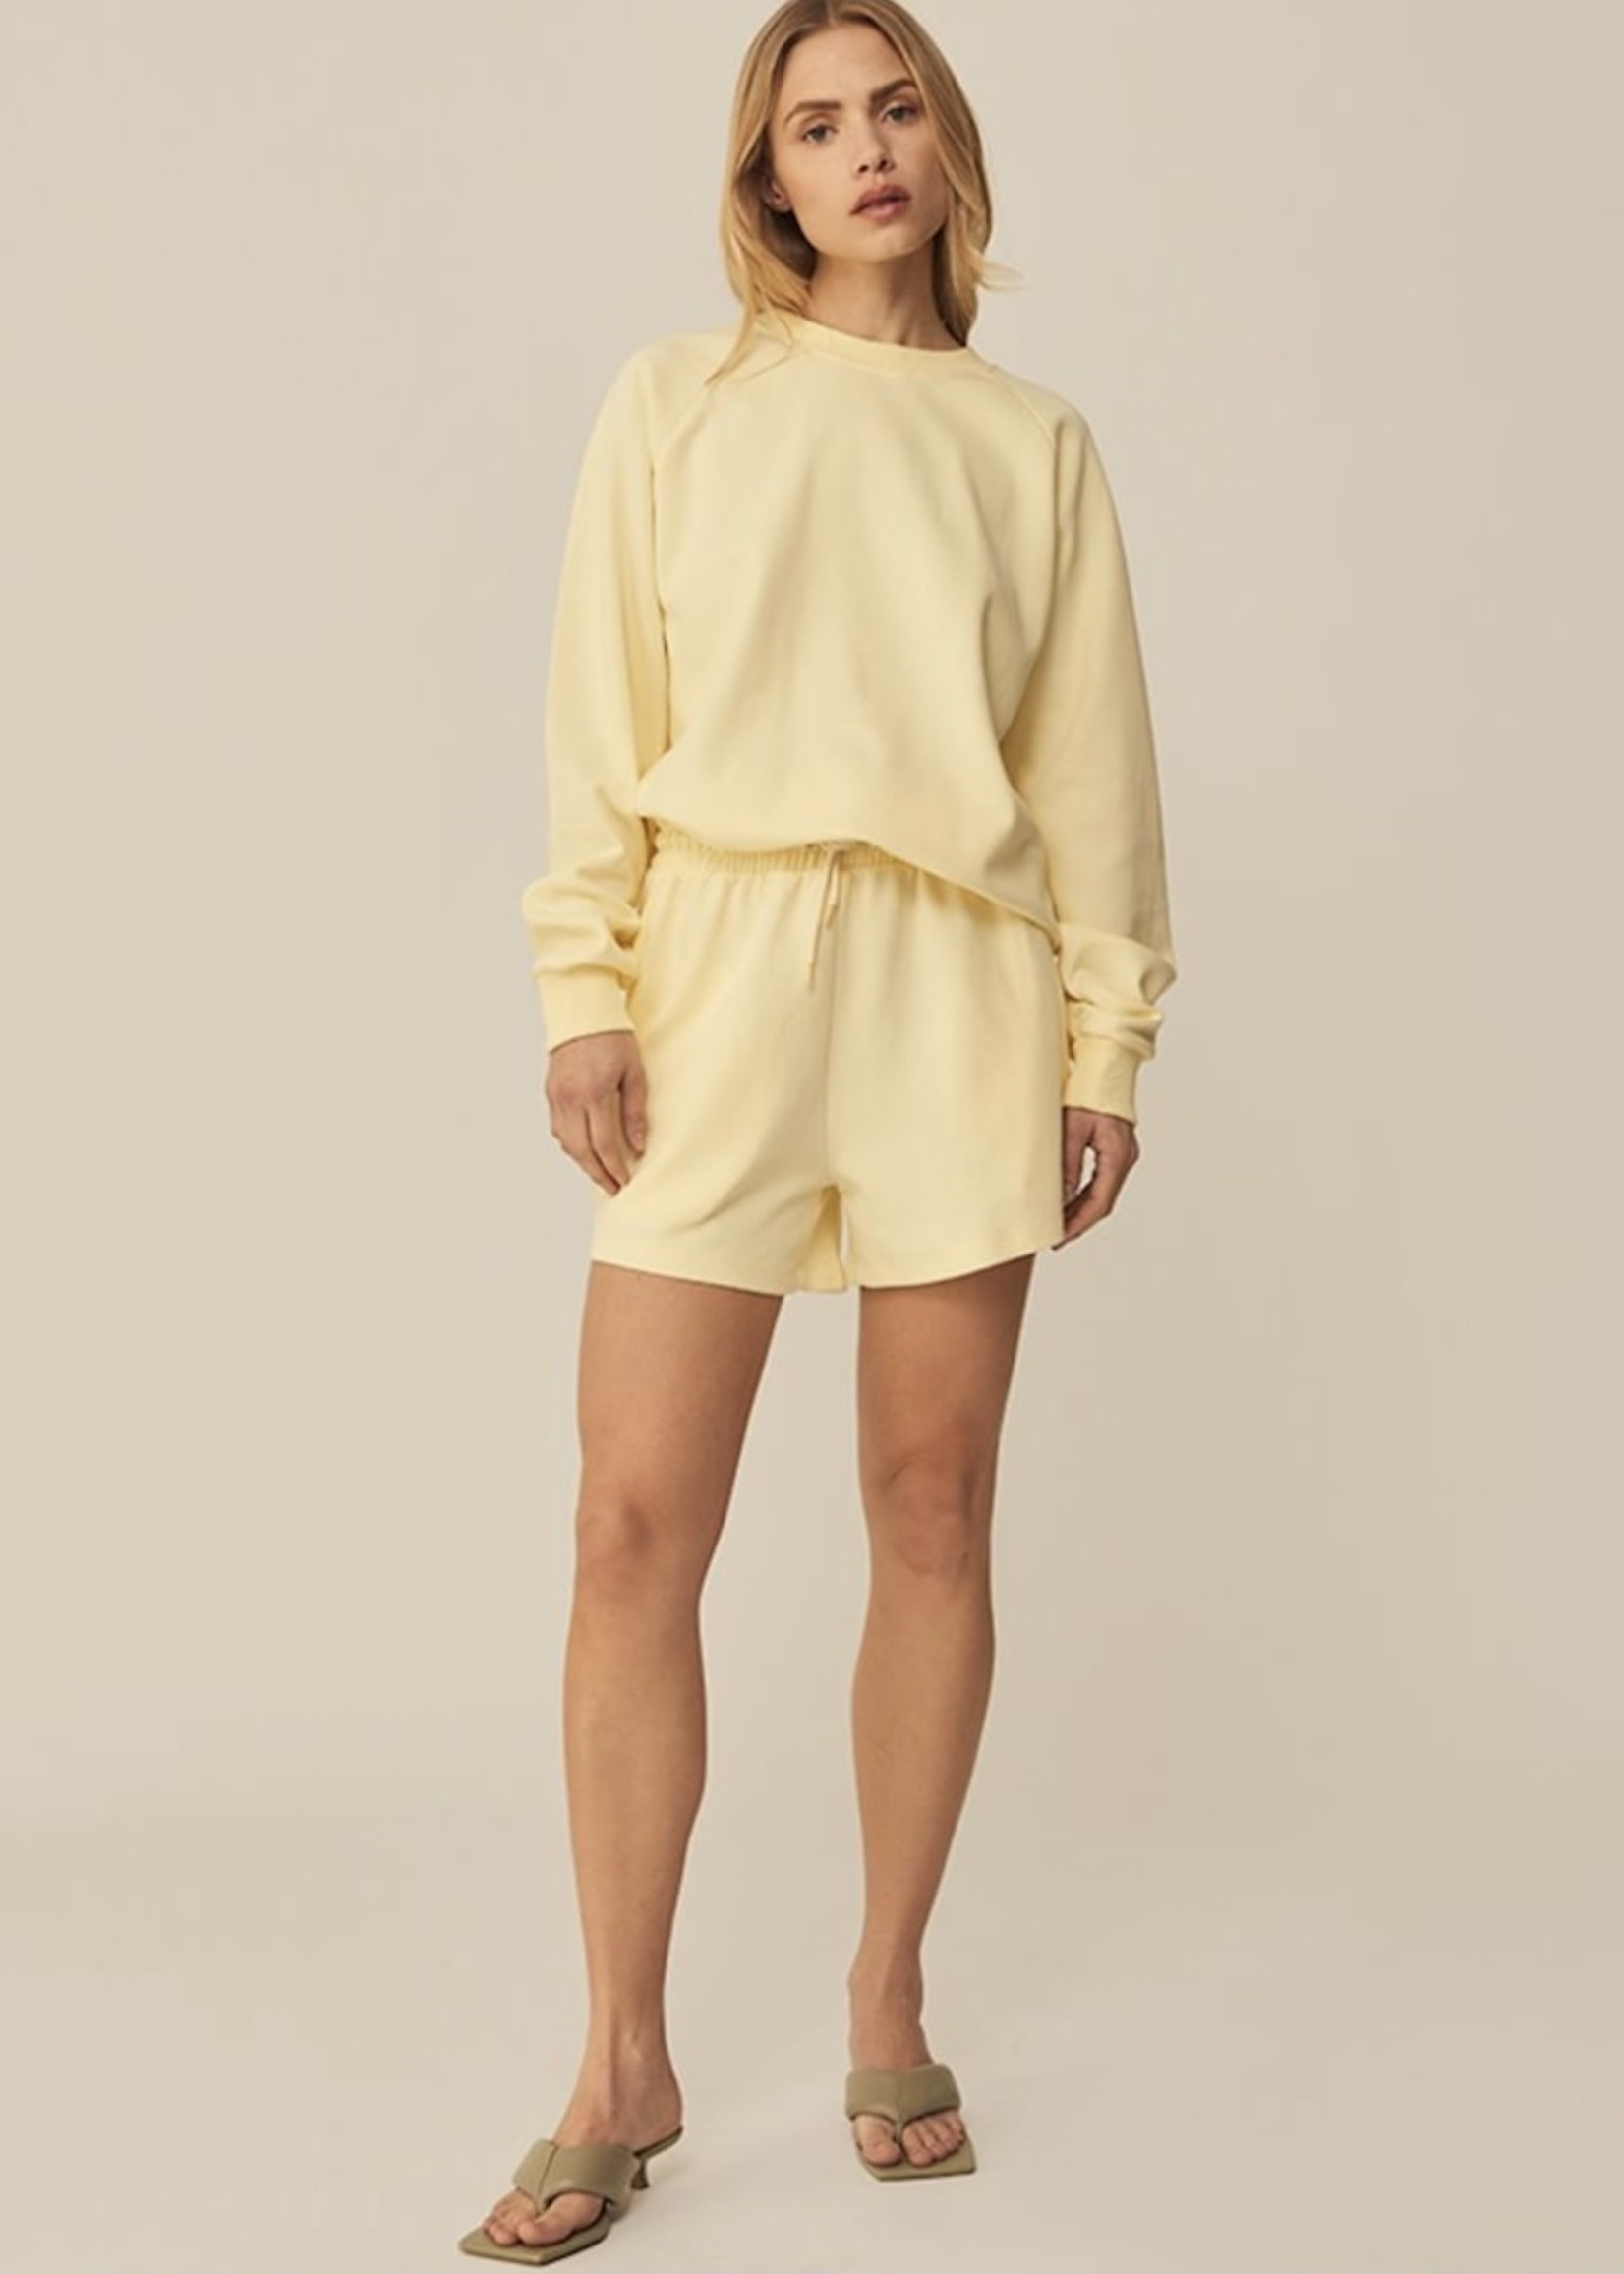 Guts & Goats Julia Yellow Sweater